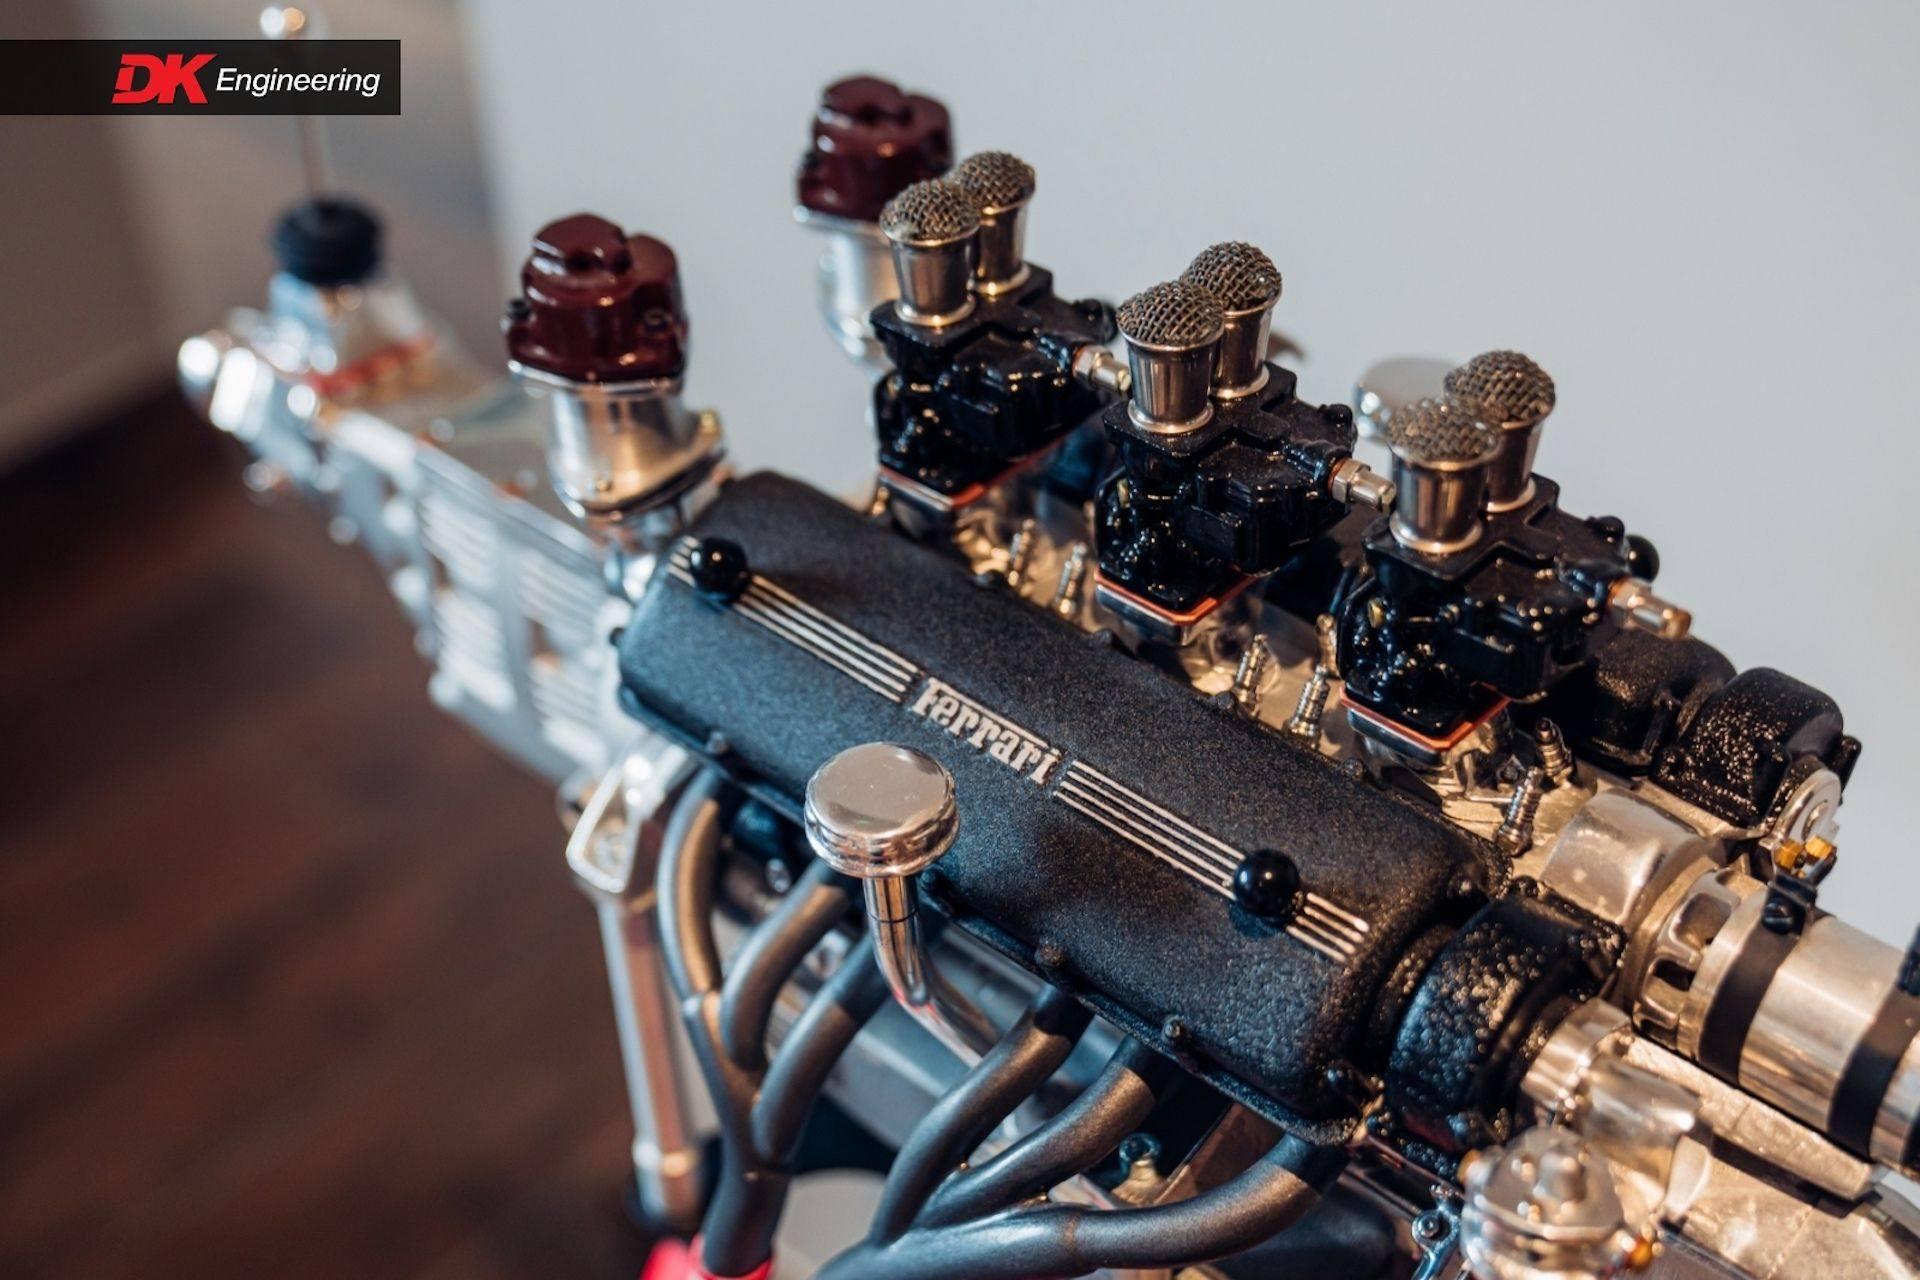 Terzo-Dalia-Ferrari-engines-16